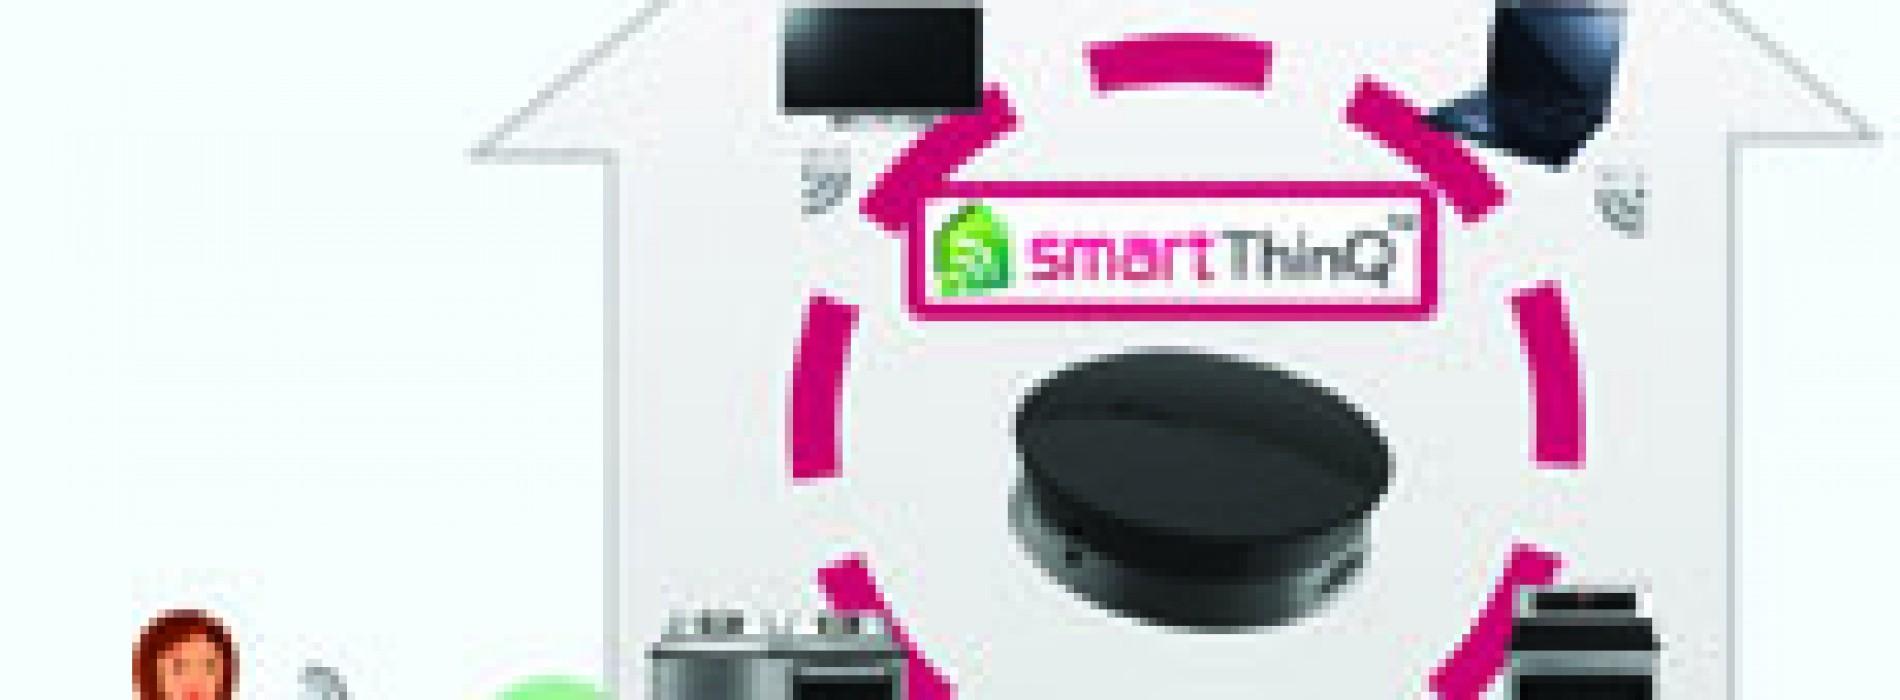 Smart ThinQ crea hogares inteligentes